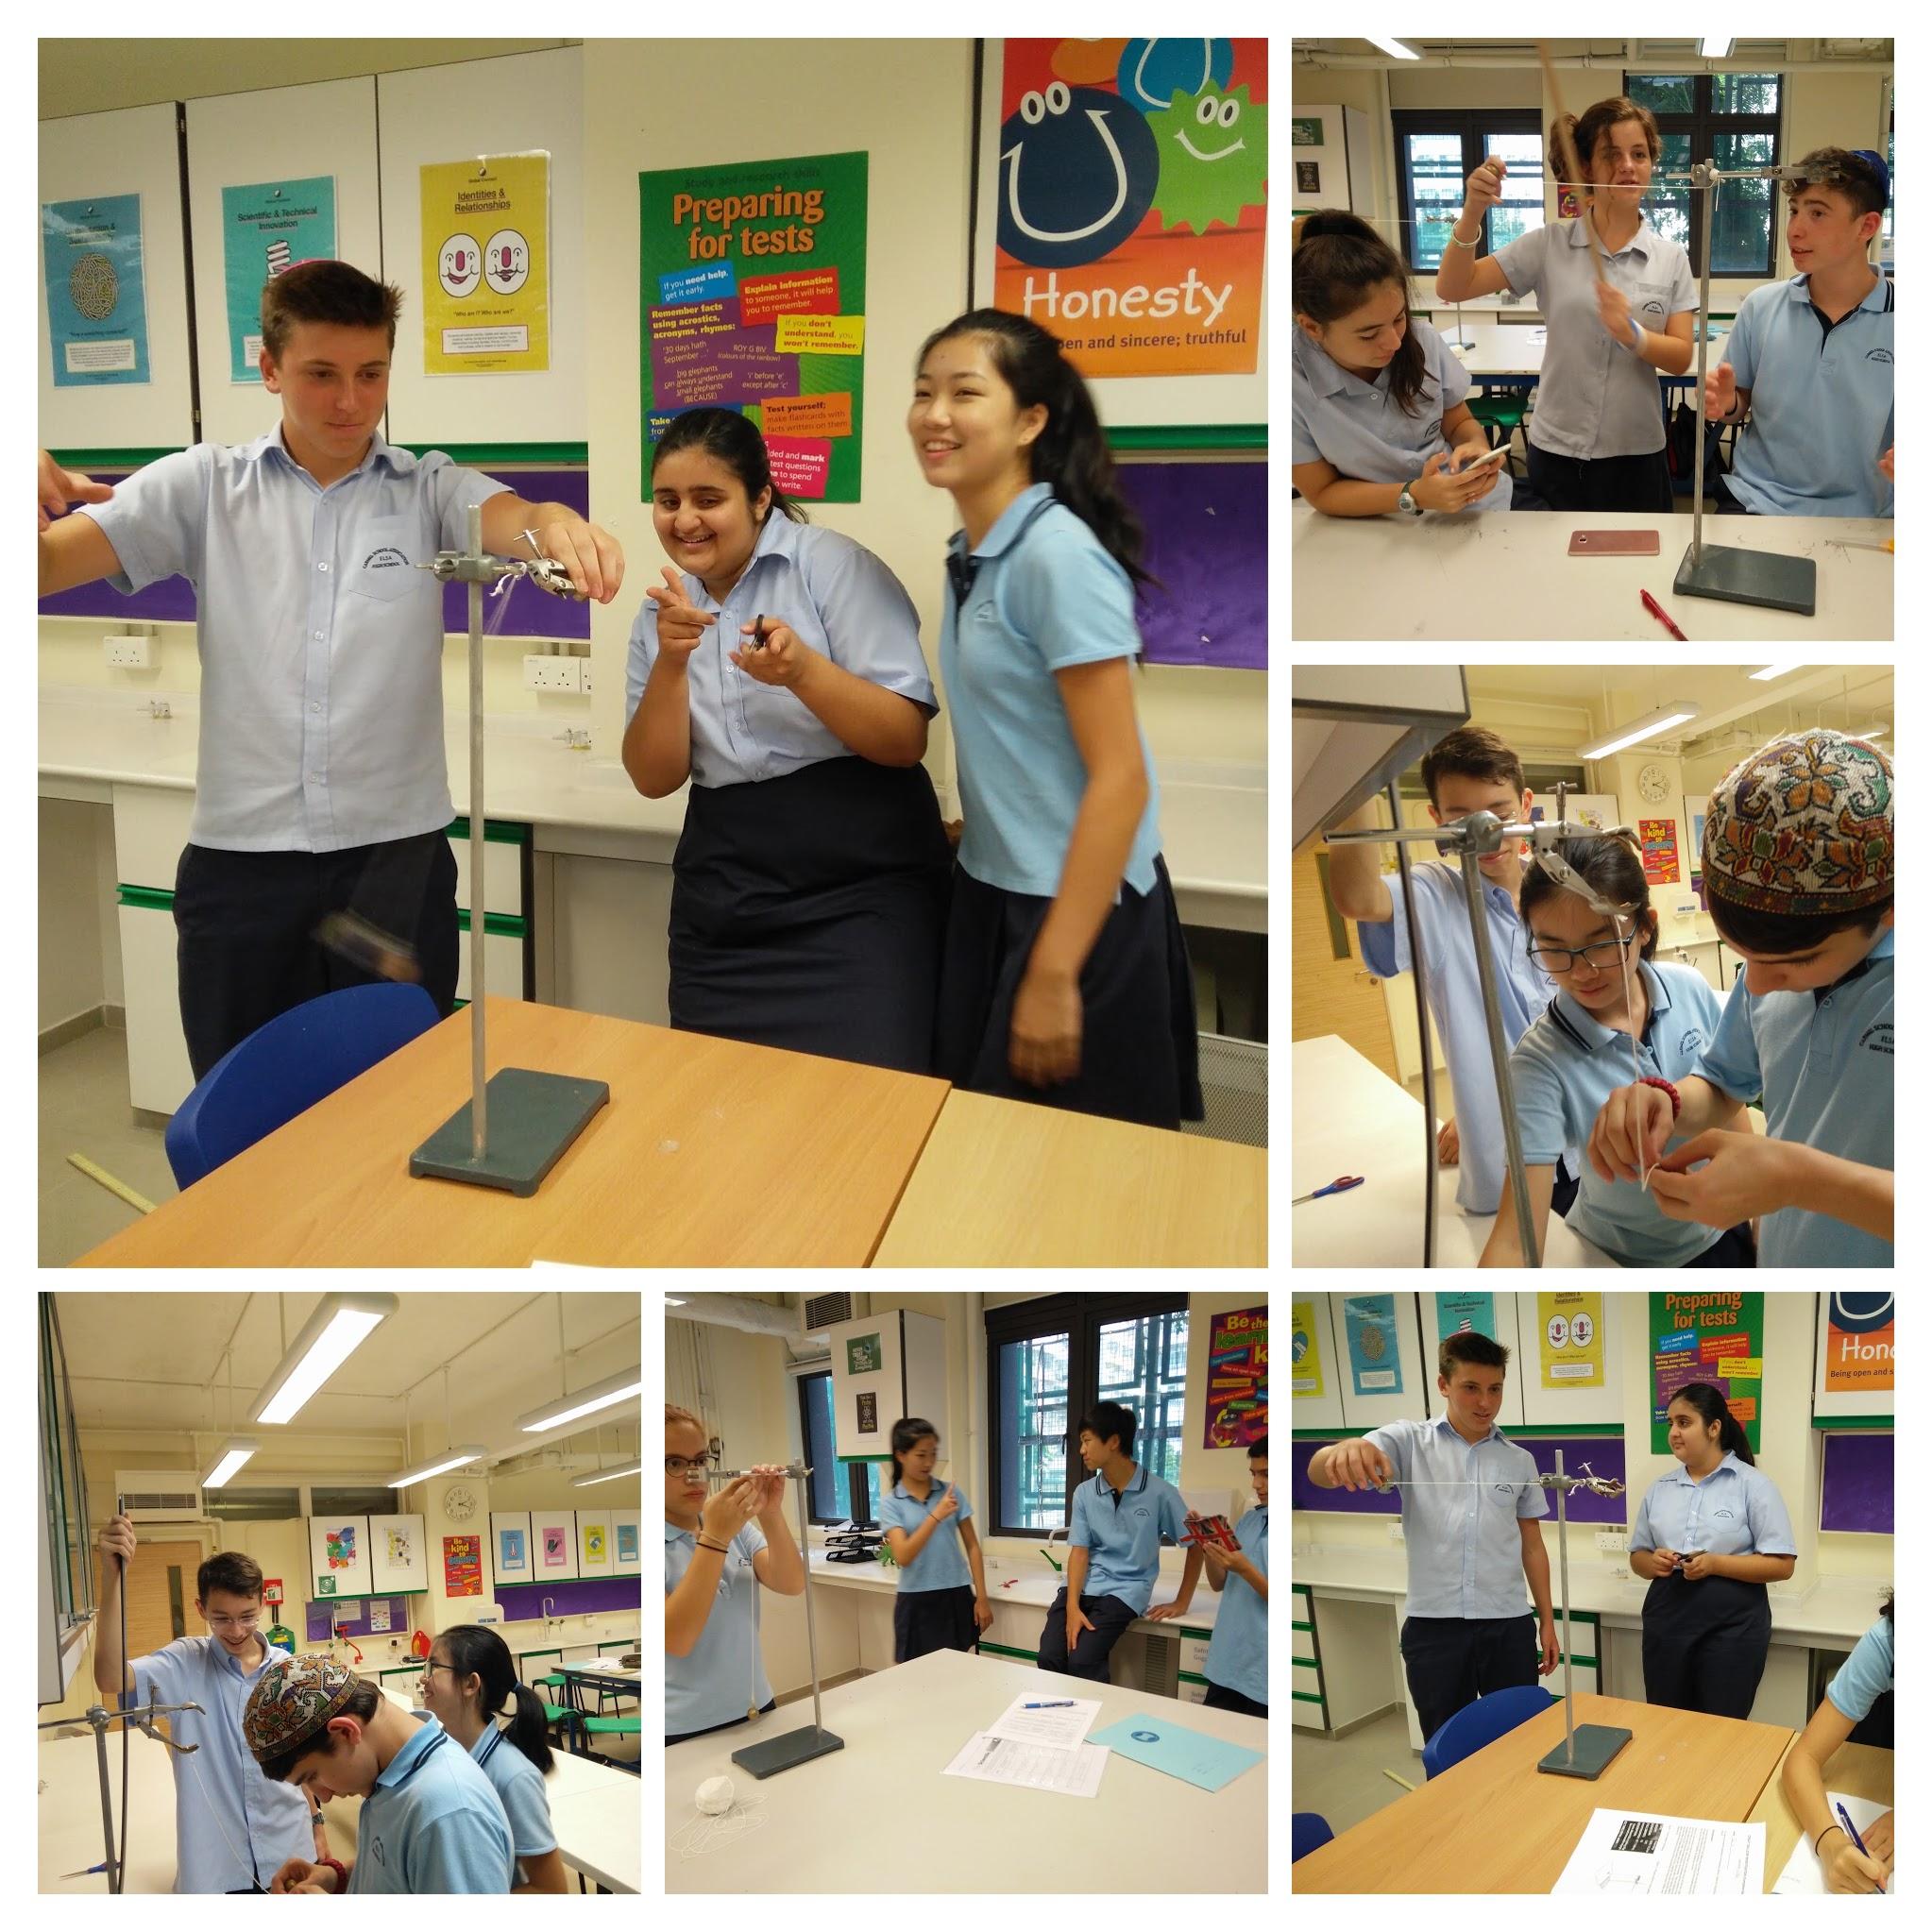 Elementary School National Curriculum: The IB Curriculum At Carmel School Association